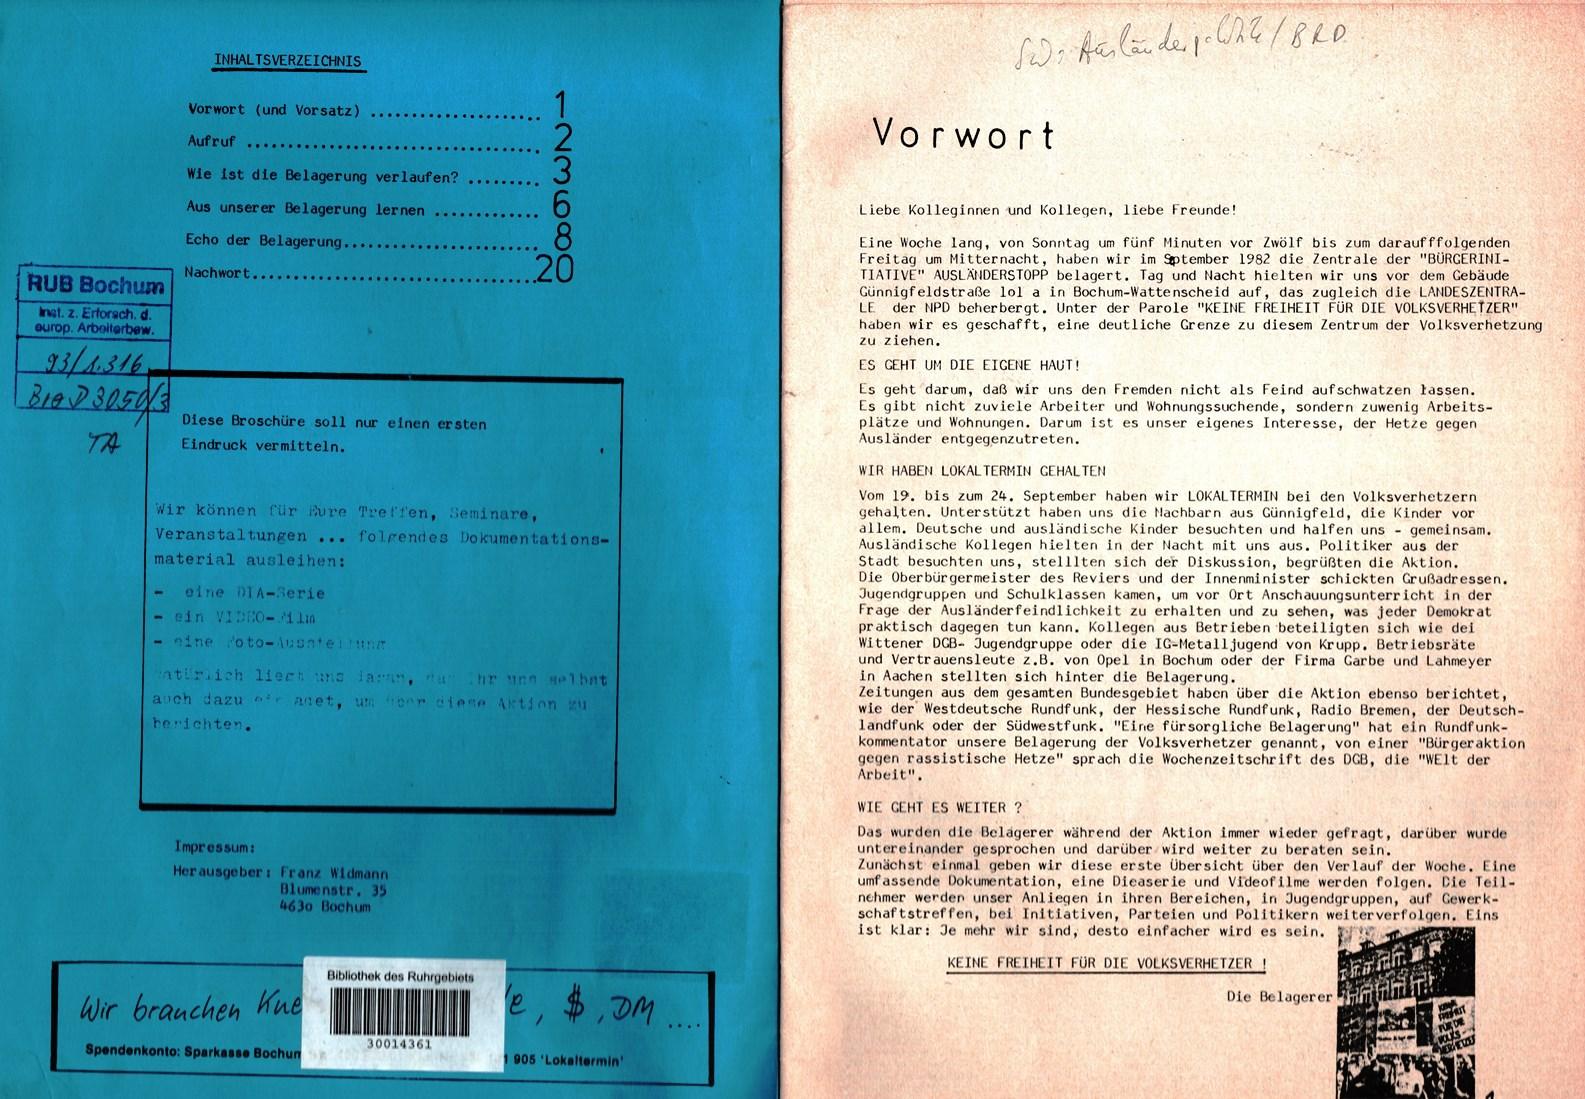 Bochum_1982_BI_Auslaenderstopp_belagern_002